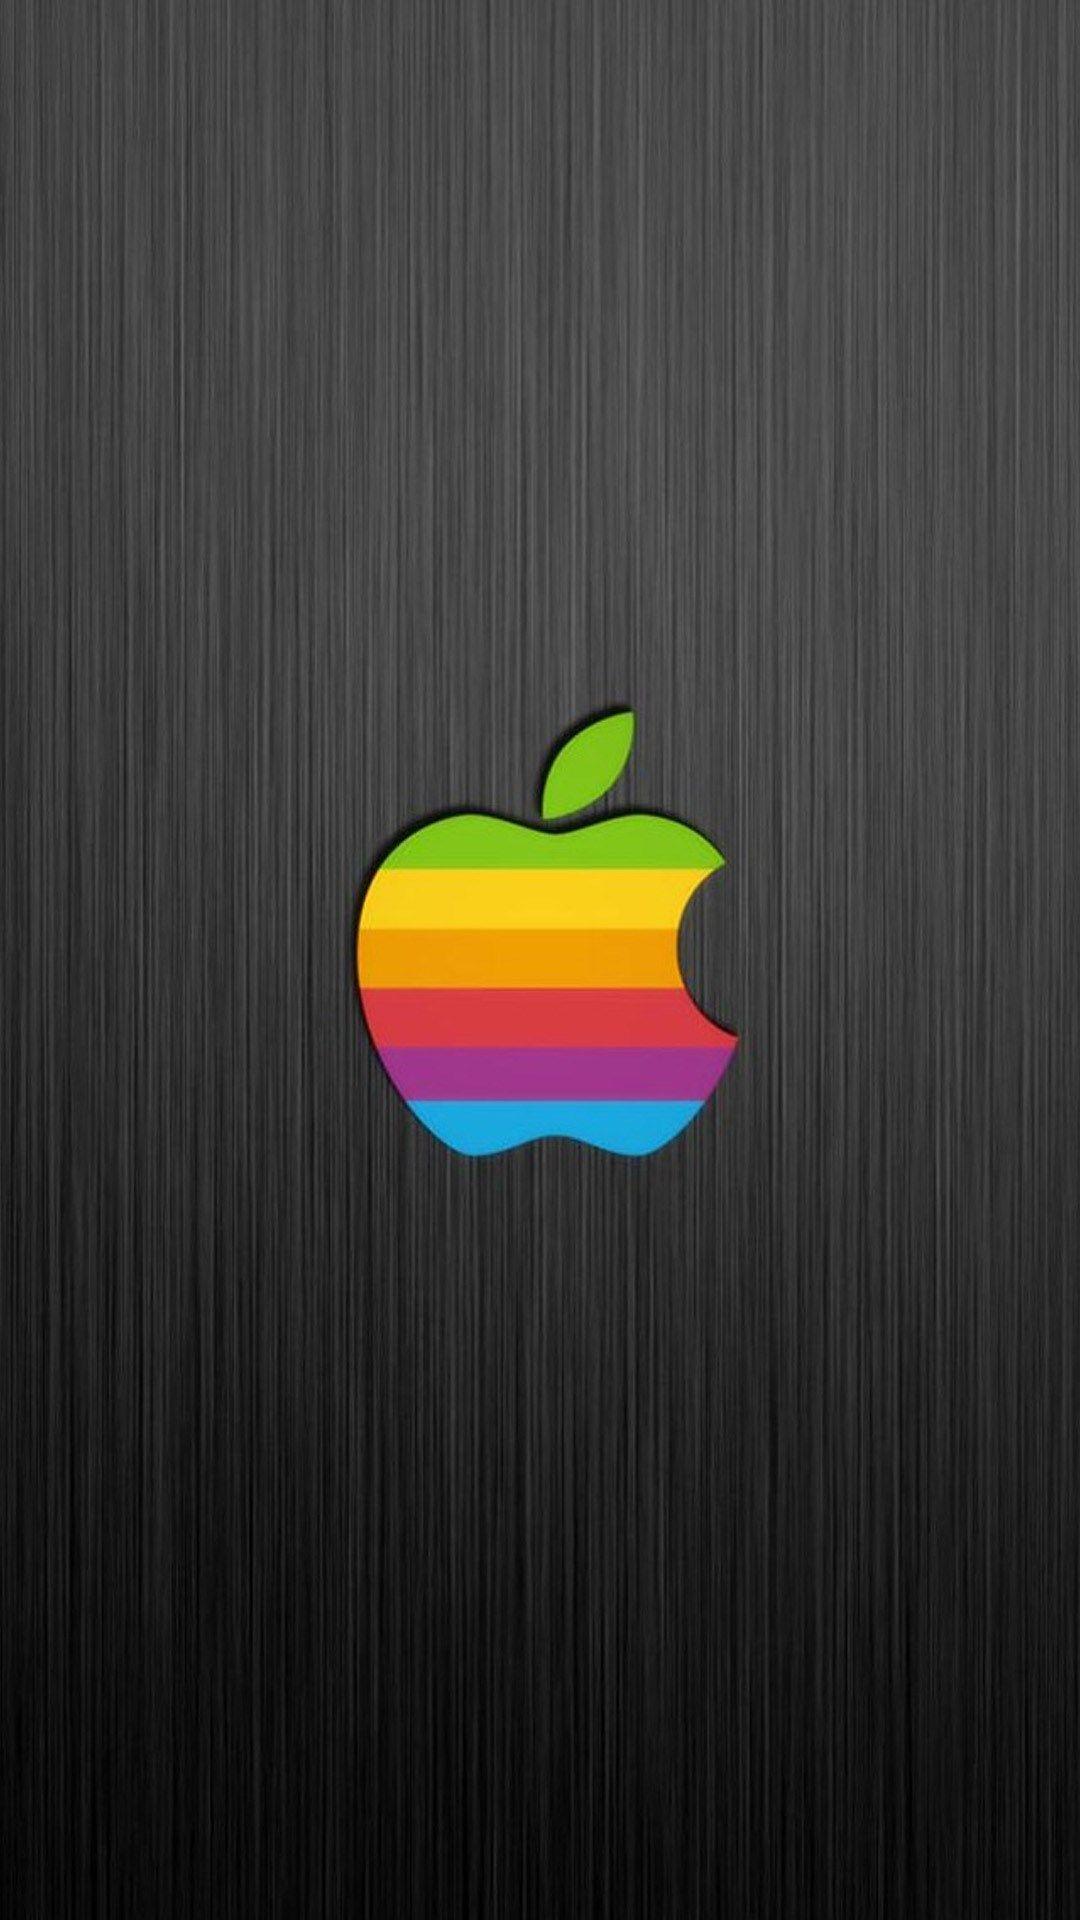 Apple Logo Wallpaper Hd For Iphone